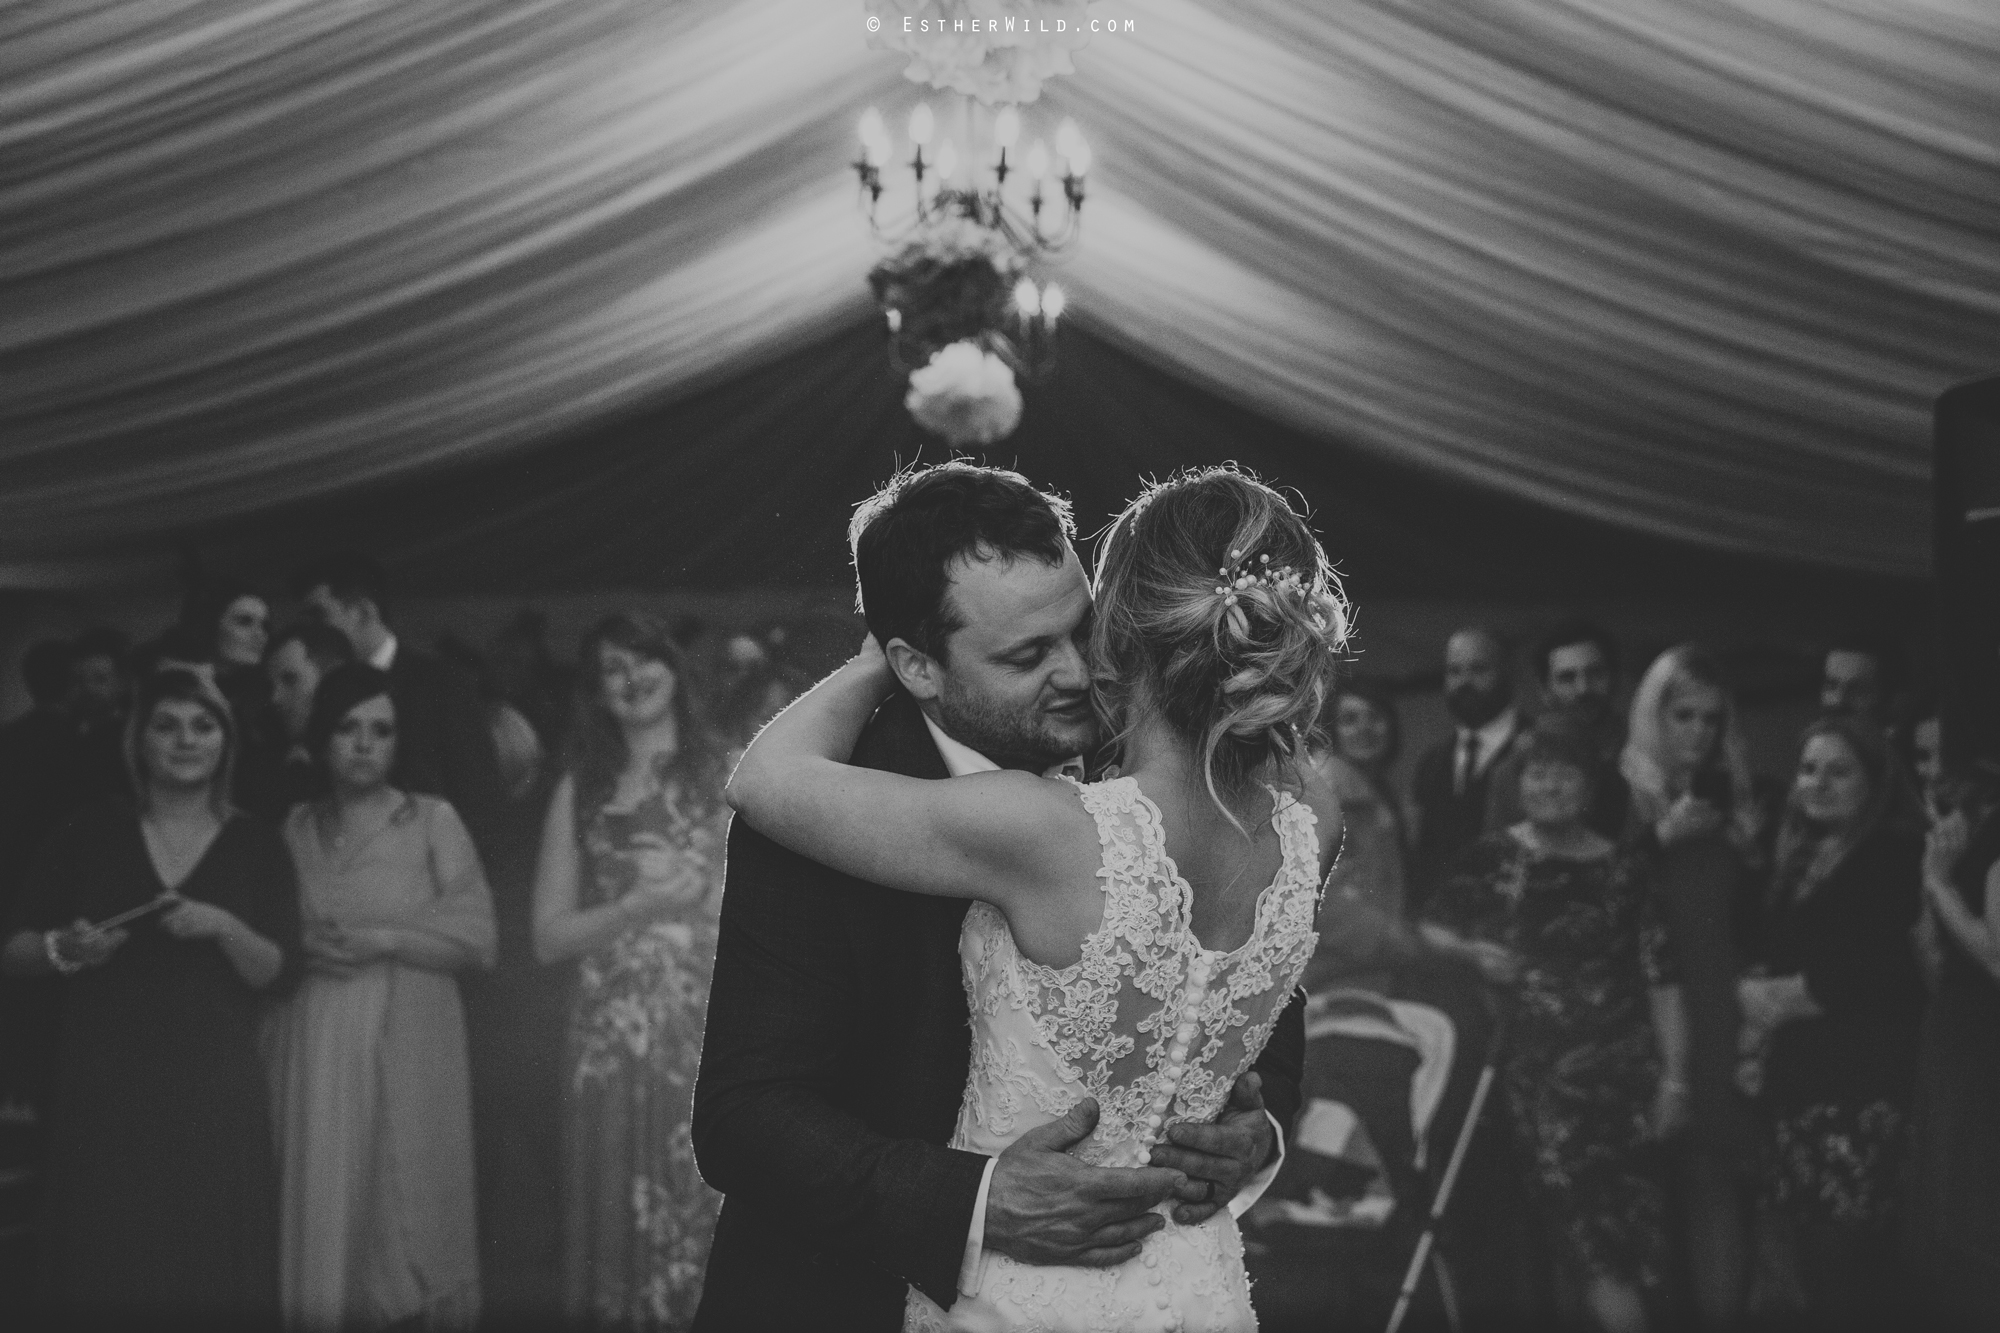 Wedding_Photography_Diss_Gawdy_Hall_Redenhall_Church_Norfolk_Winter_Esther_Wild_Copyright_IMG_2515-2.jpg